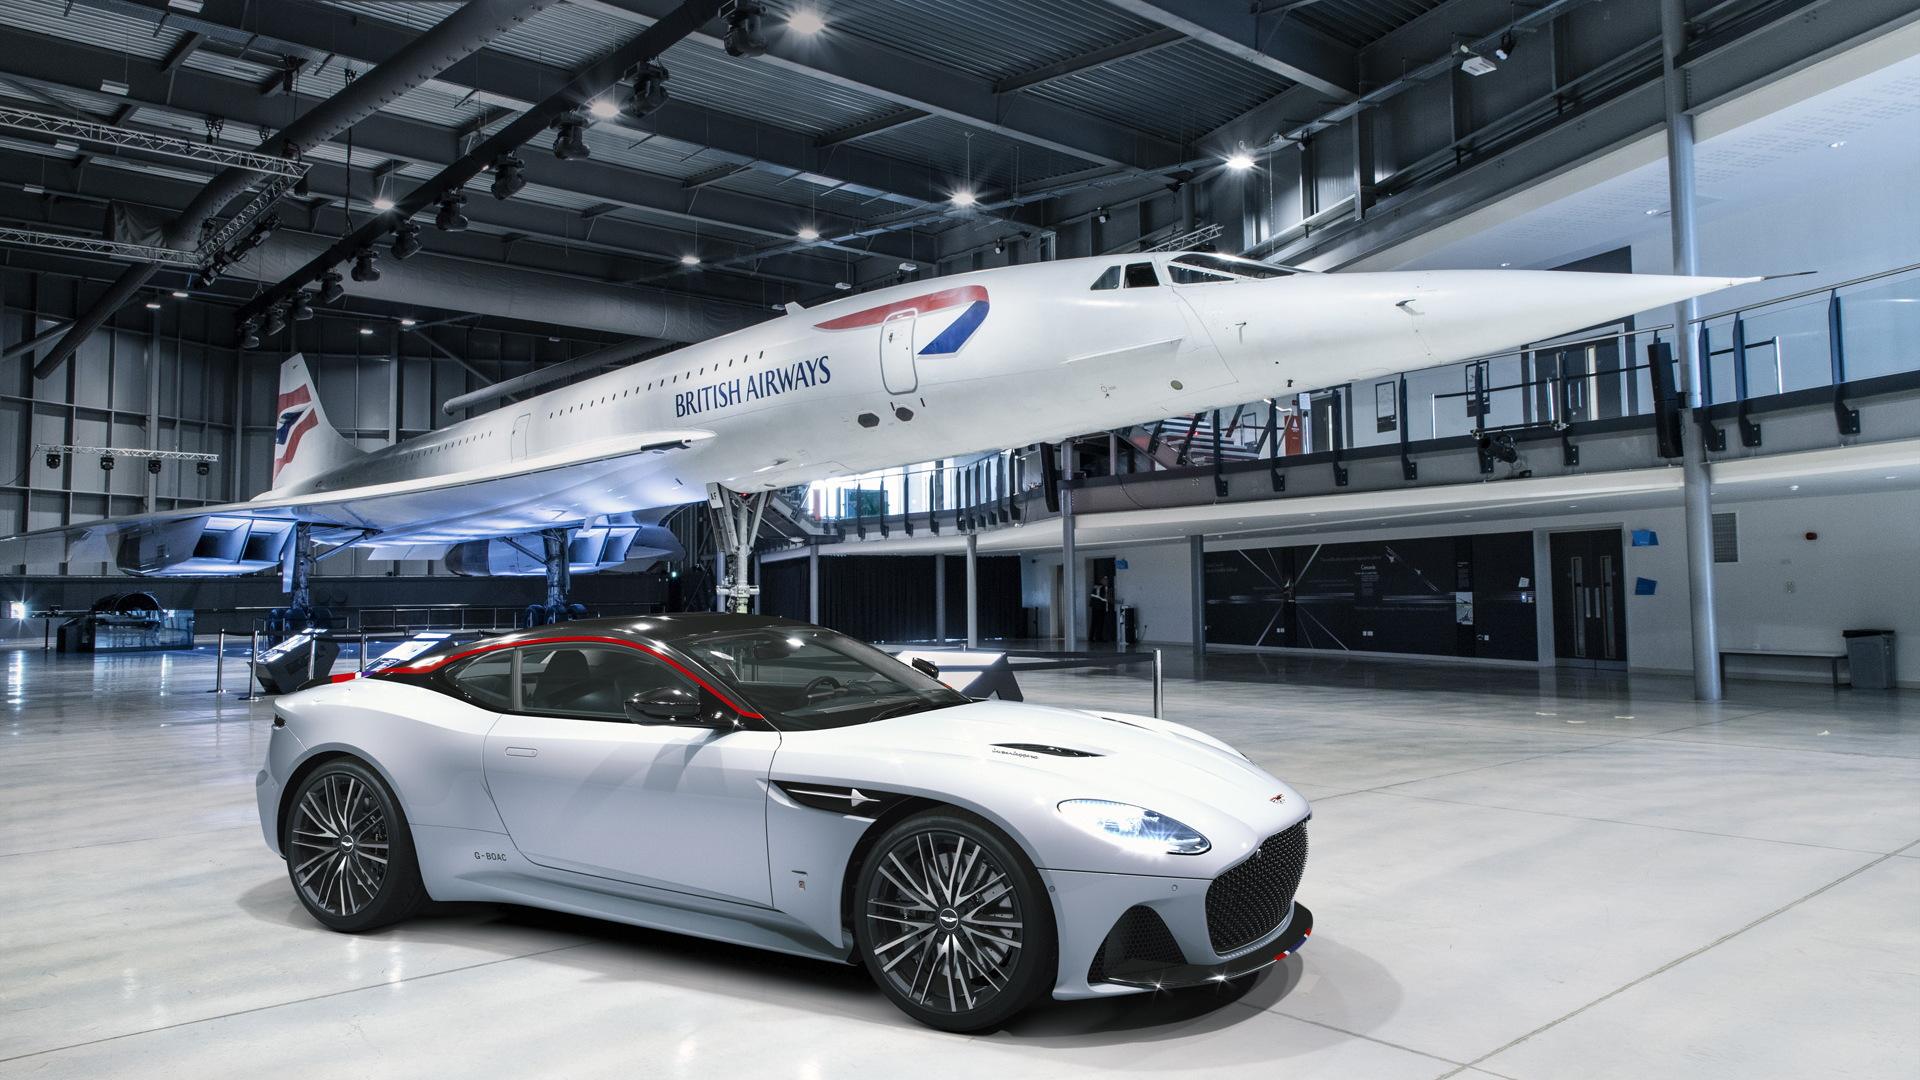 2019 Aston Martin DBS Superleggera Concorde edition